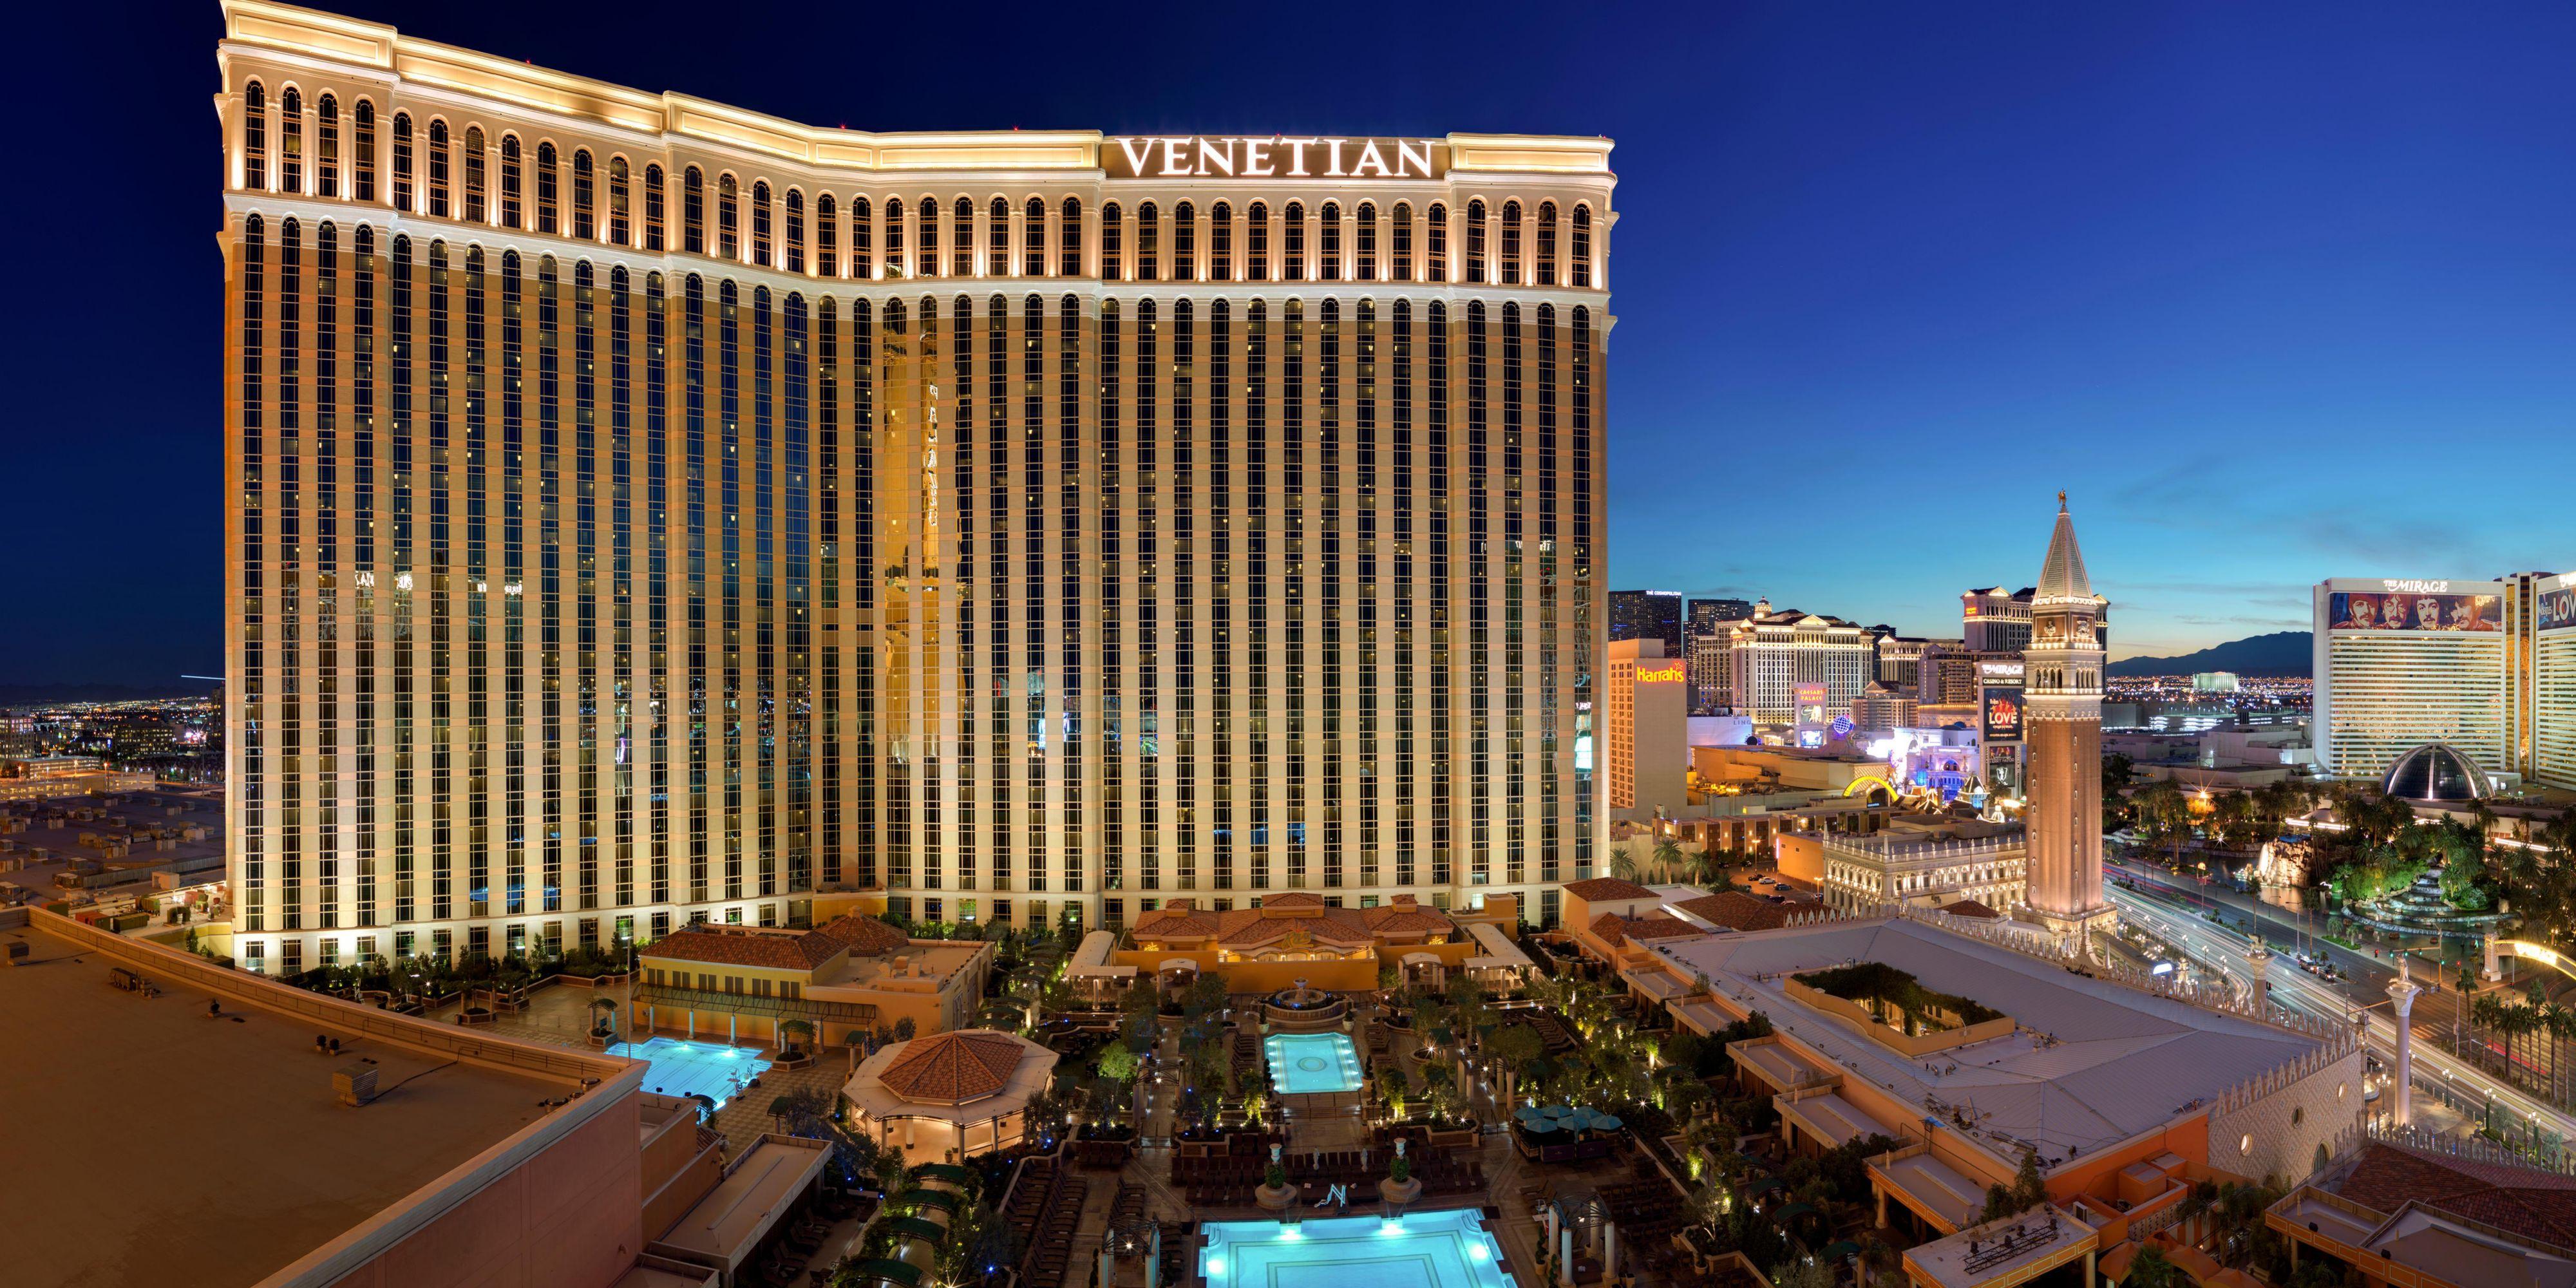 venetian resort hotel casino las vegas (nv united states